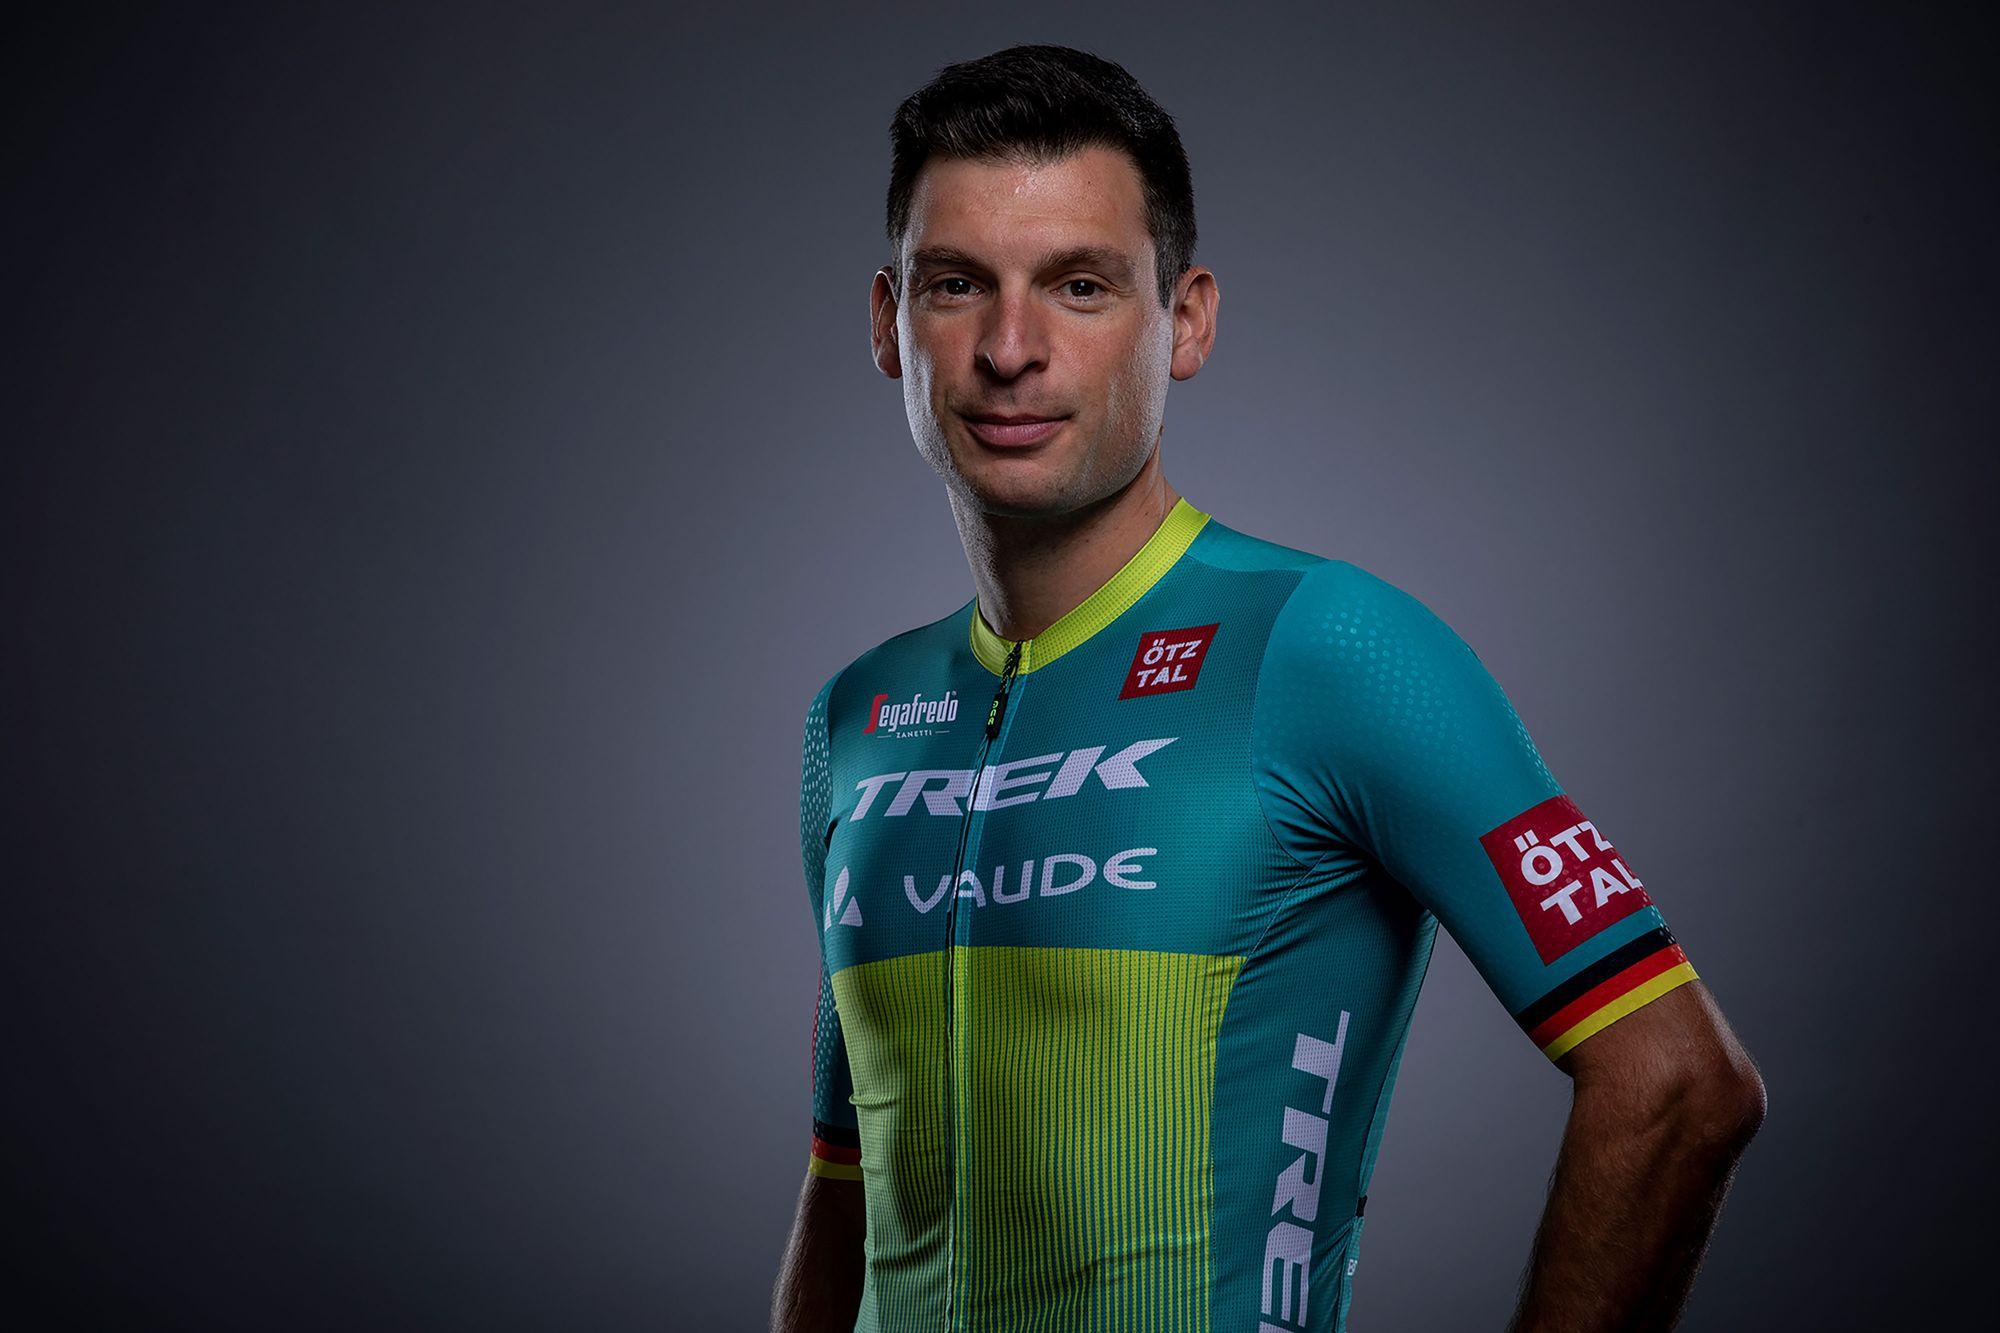 Team Trek-Vaude  Neuer Sponsor, neues Konzept